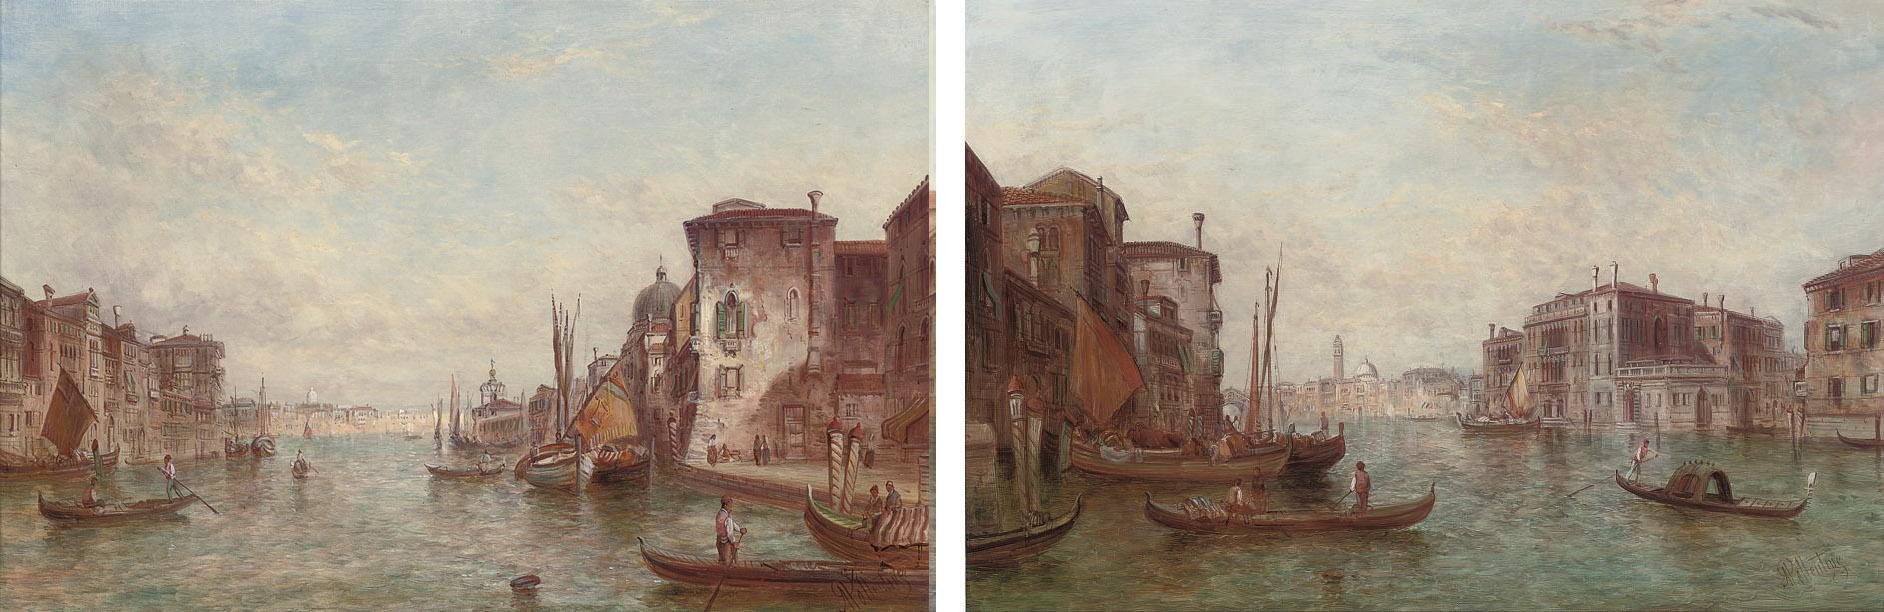 Barbariya Palace, Venice; and The Grand Canal, Venice